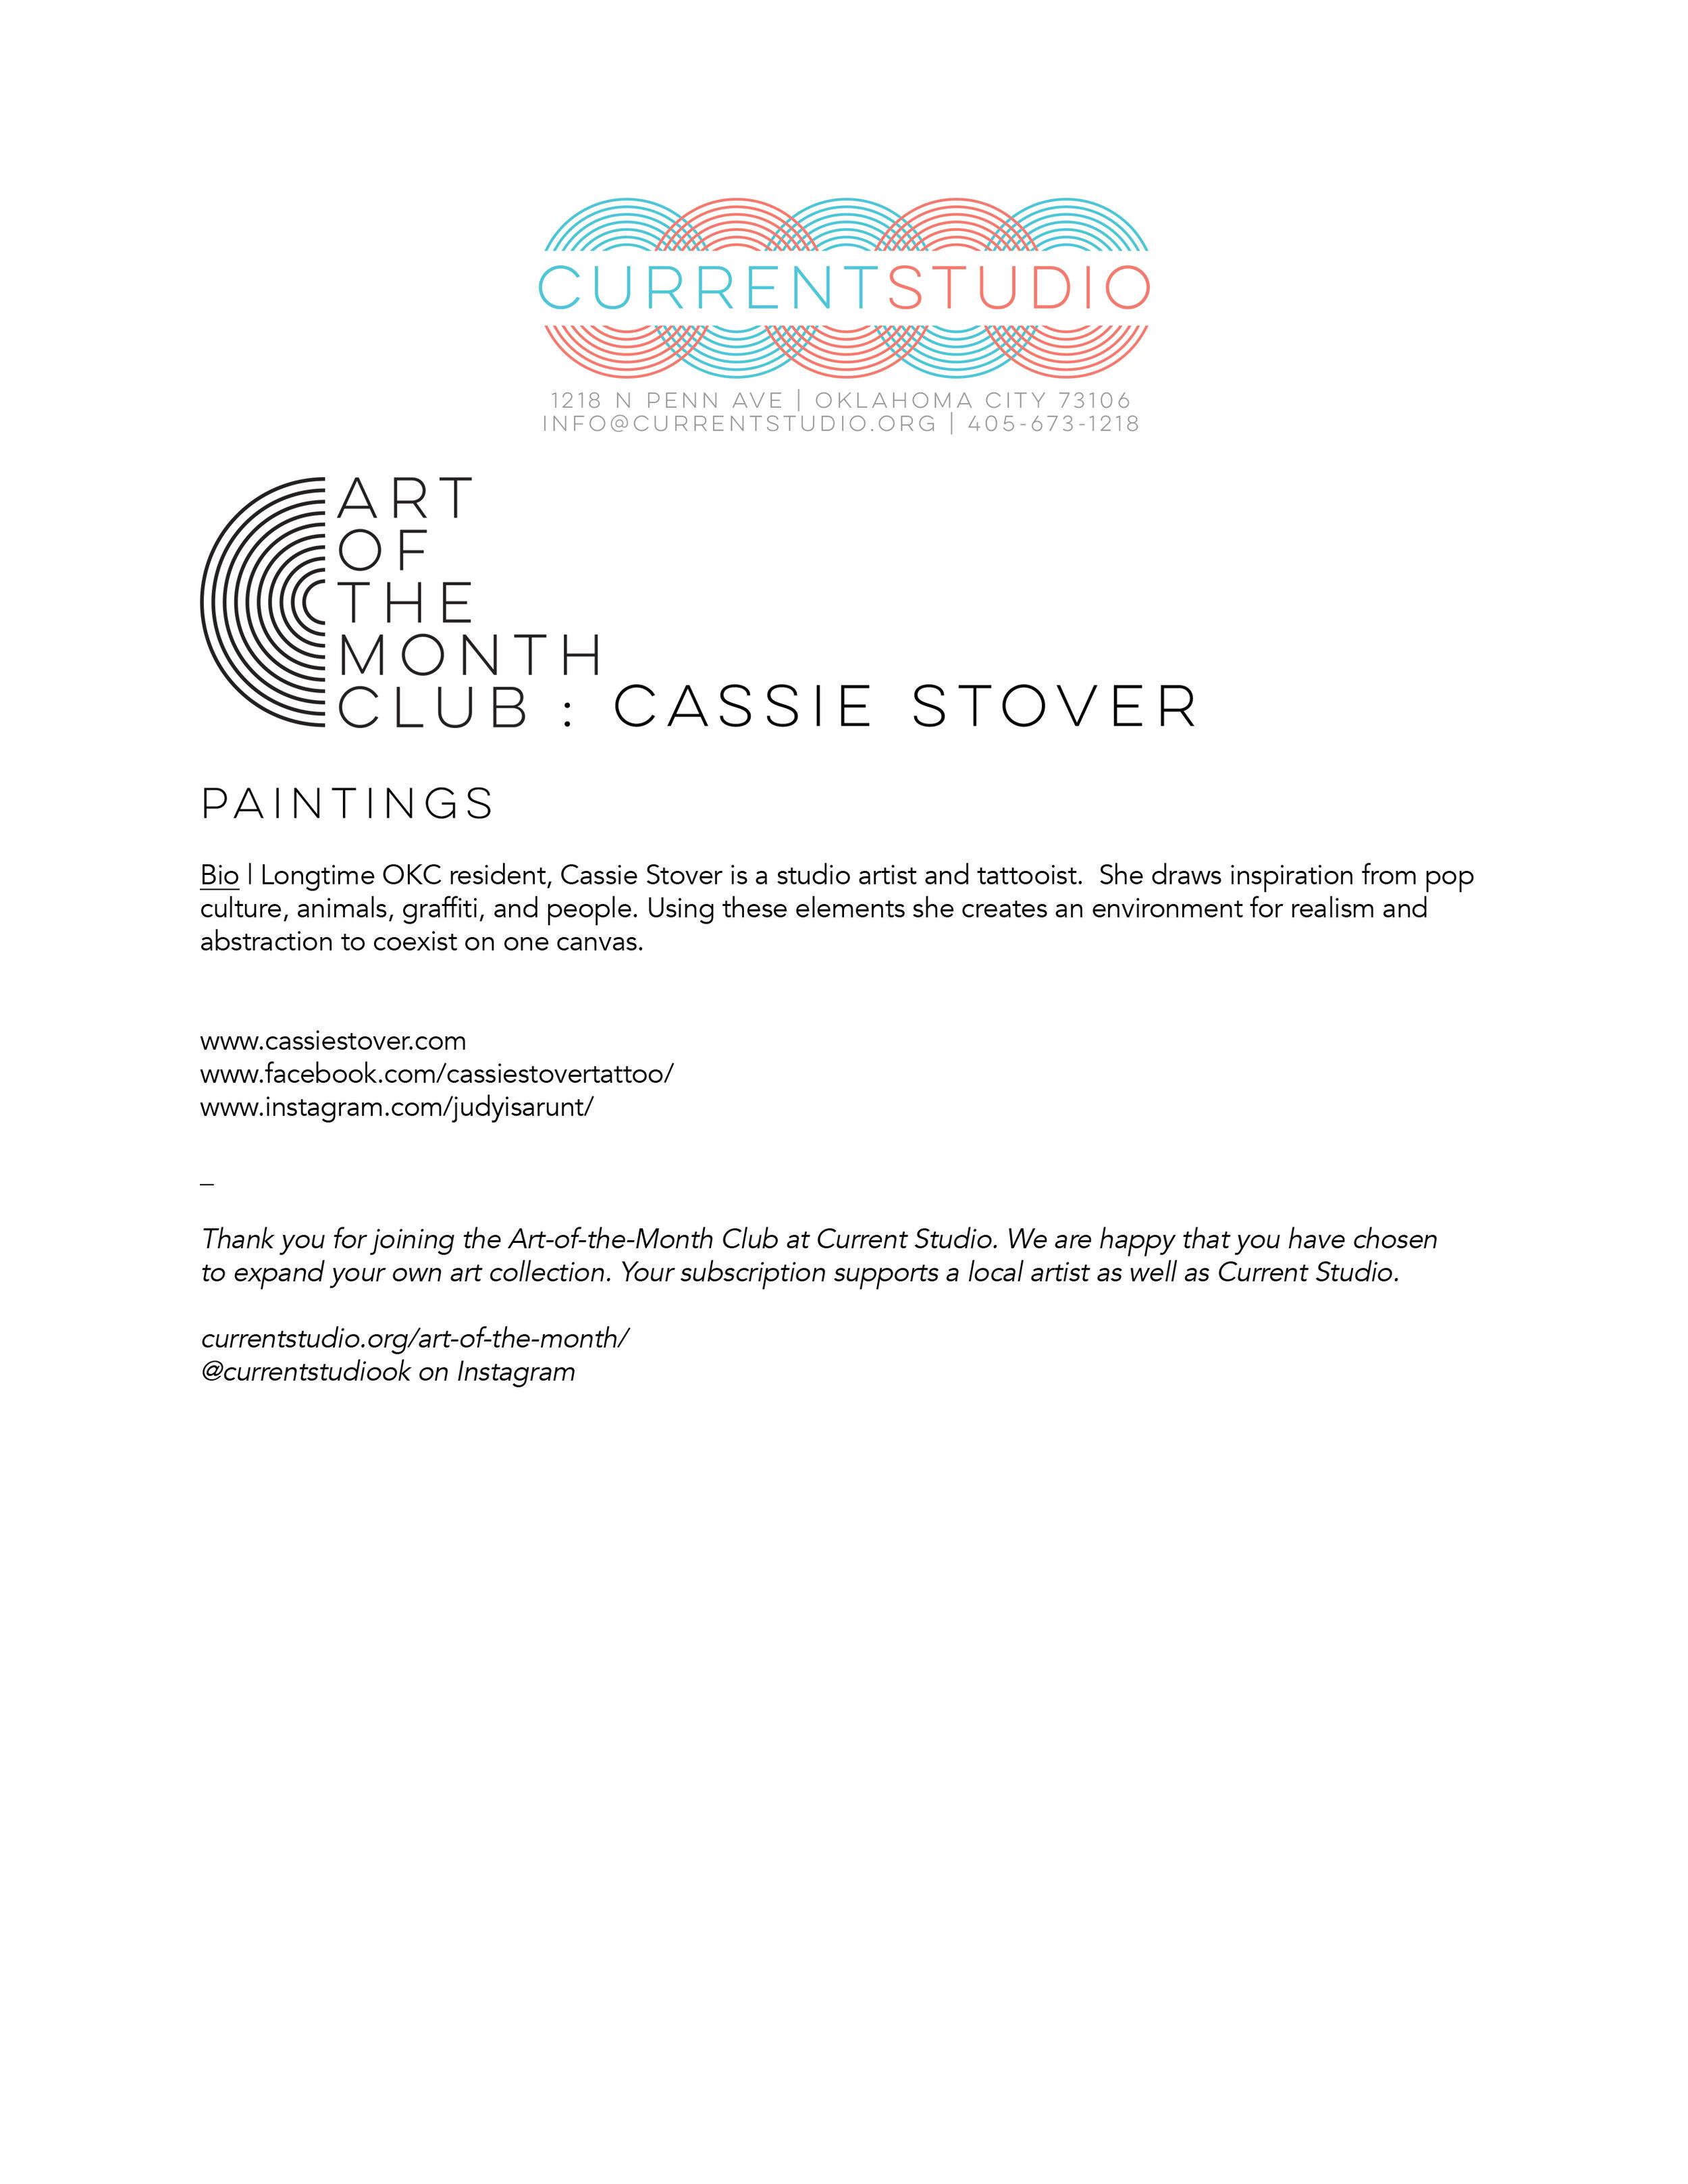 art of the month artist sheet - cassie stover.jpg